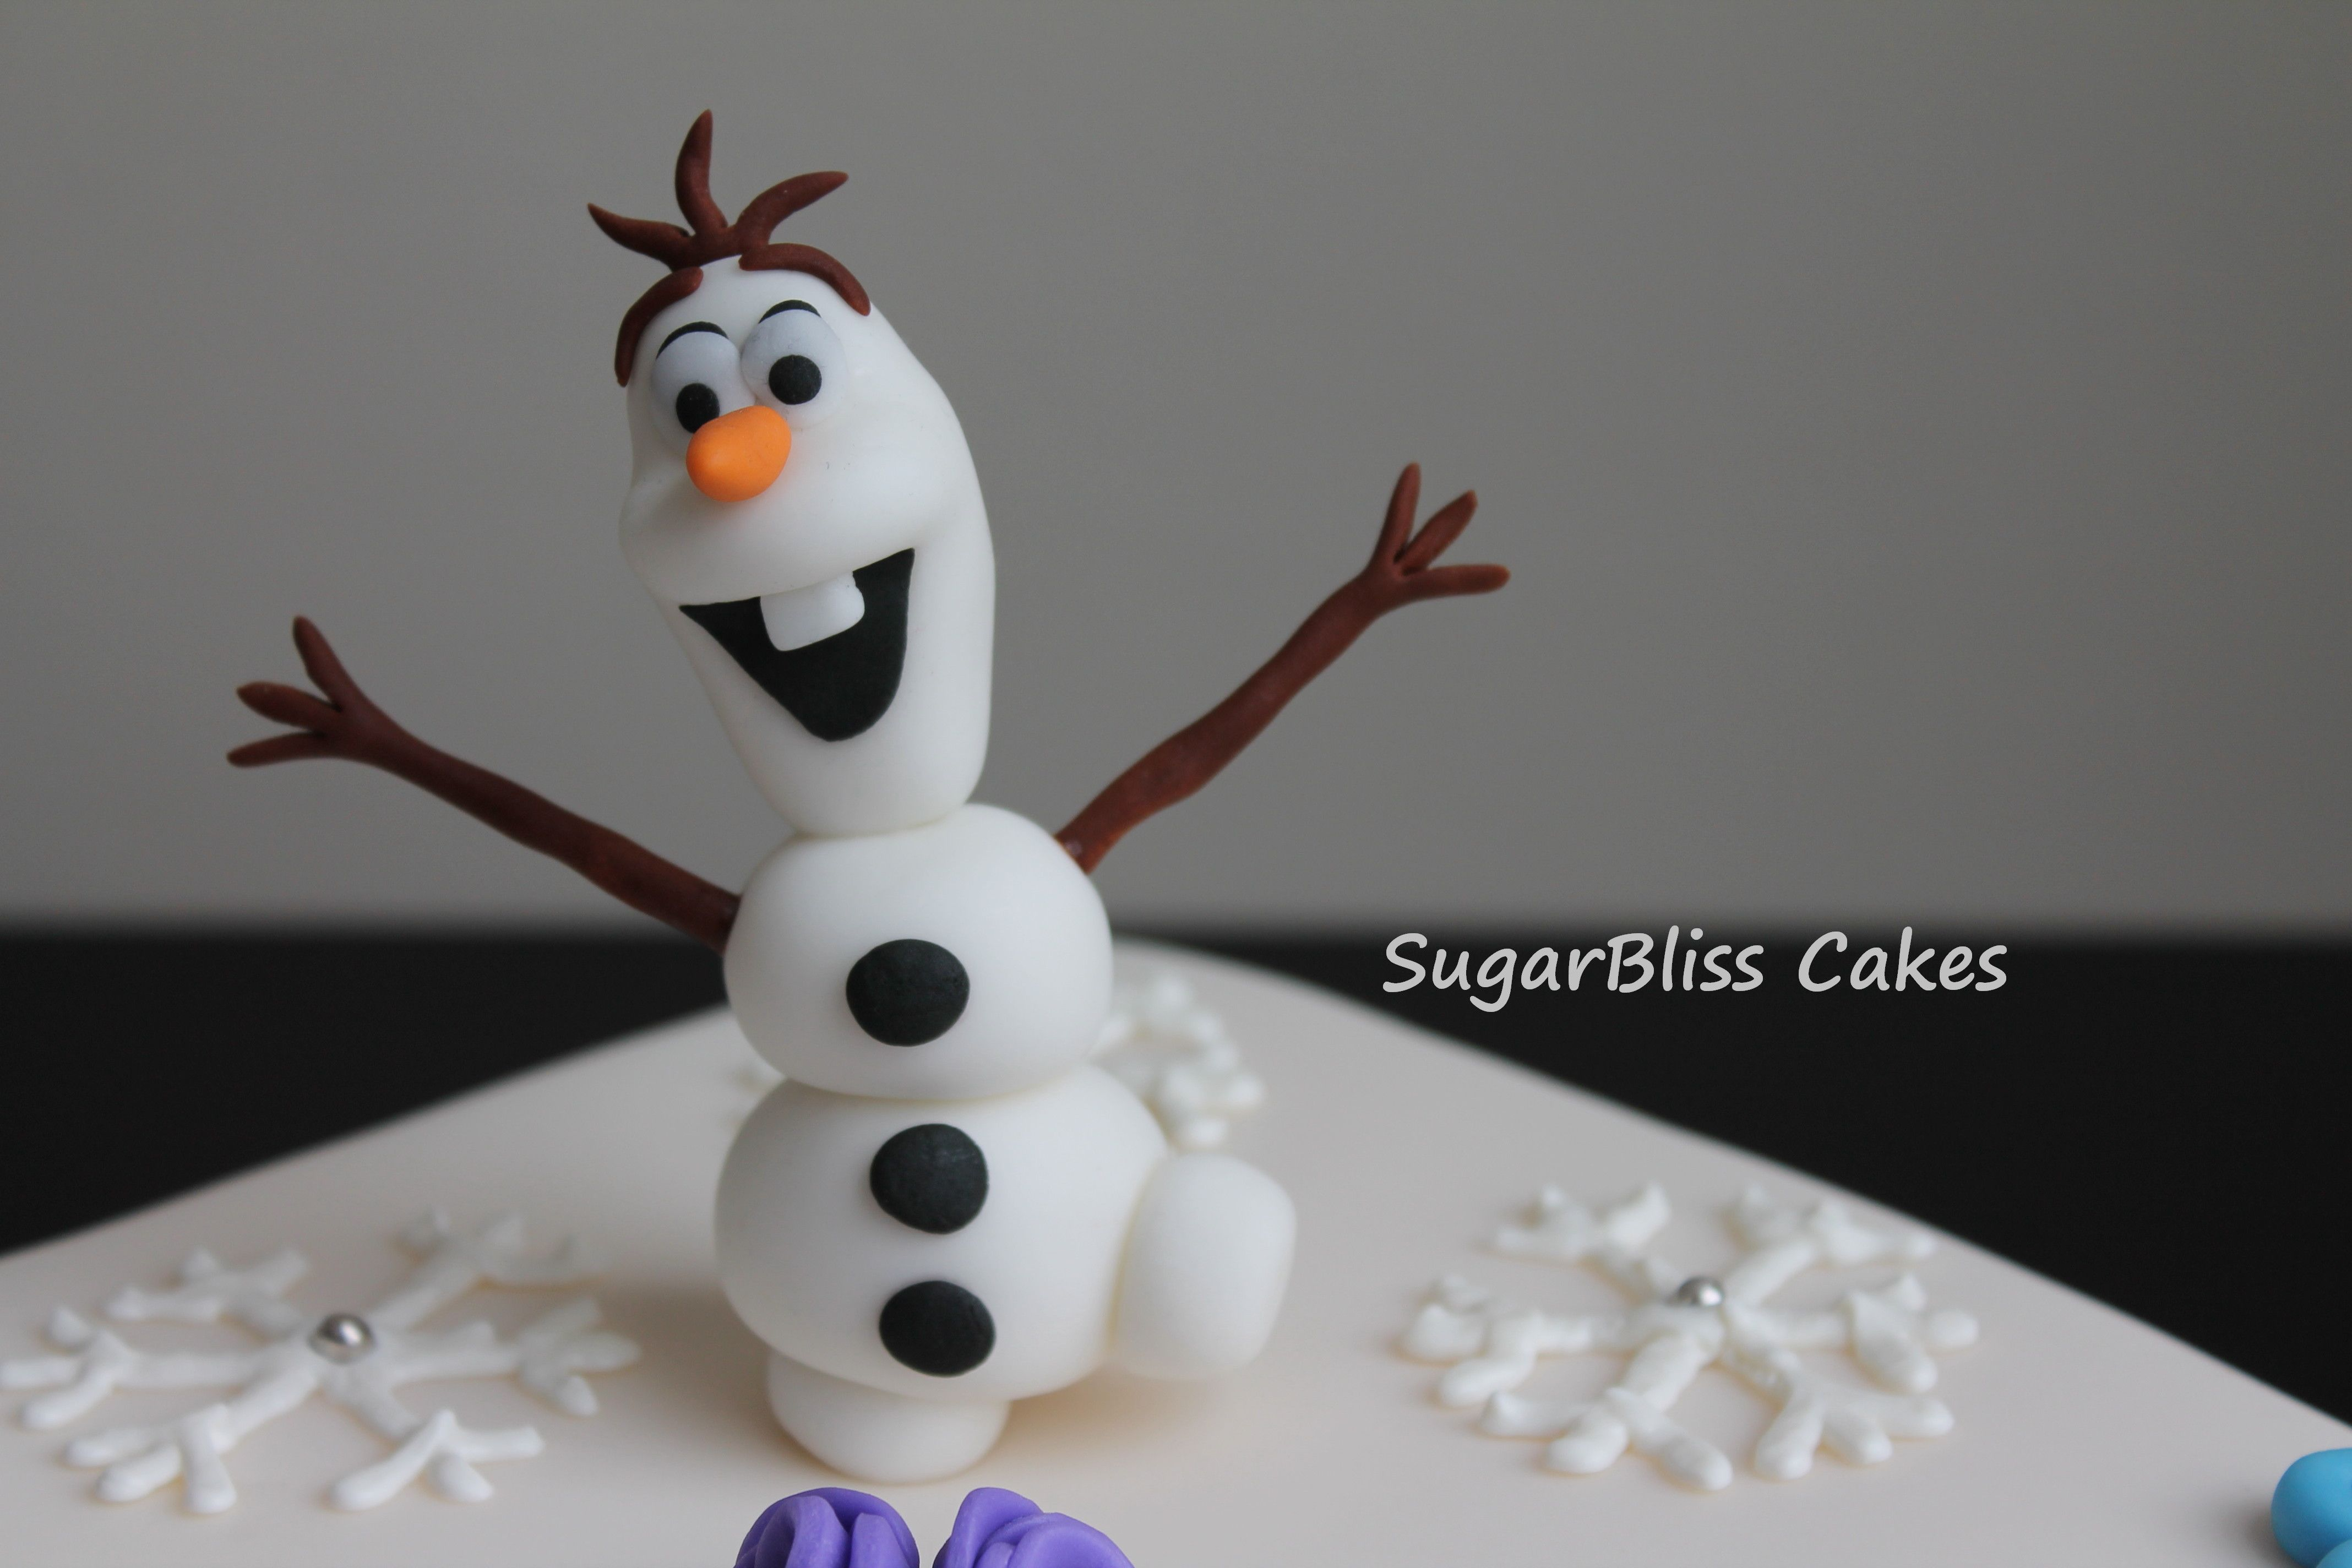 Cake Decoration Olaf : Olaf cake topper Sugar Bliss Cakes Pinterest Cakes ...